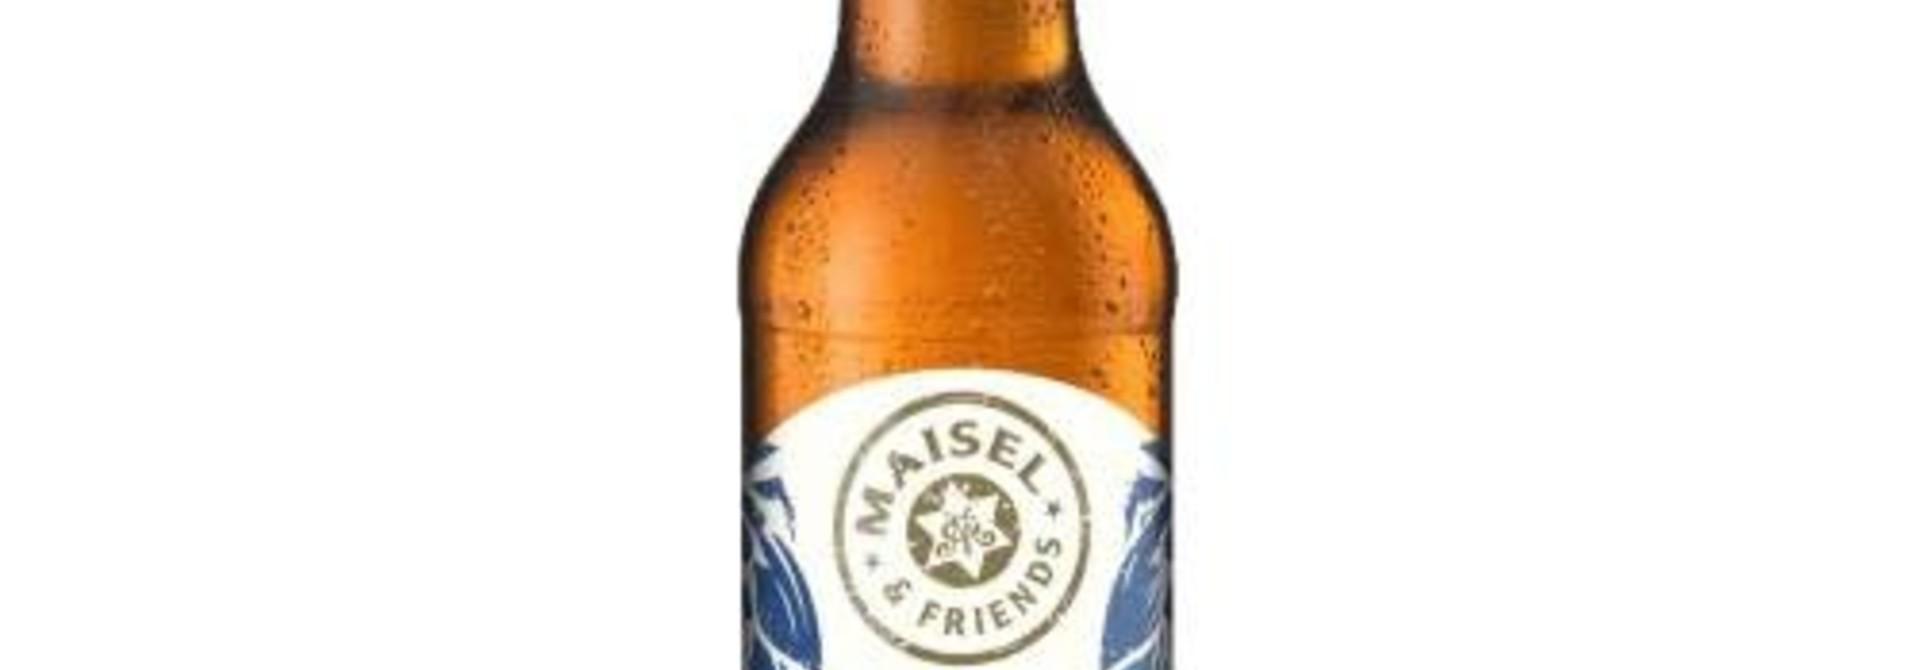 MAISEL & FRIENDS - HOPPY HELL 33CL